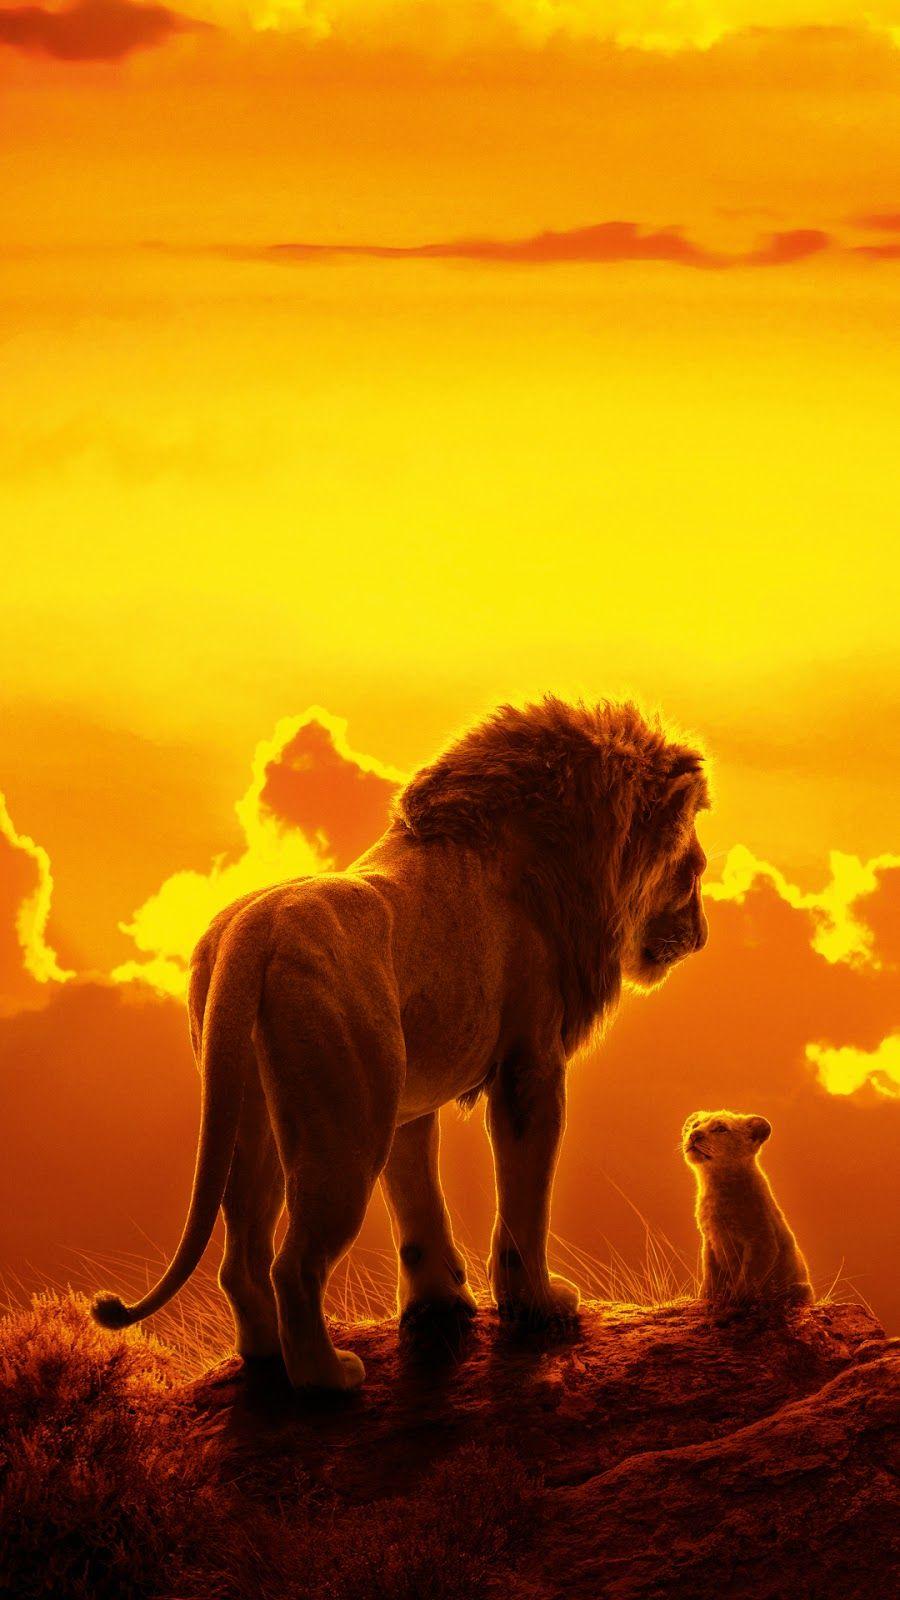 The Lion King 2019 Mobile Wallpaper Hd Mobile Walls Lion King Pictures Lion Pictures Wallpaper Iphone Cute Lock screen lion king wallpaper hd 2019